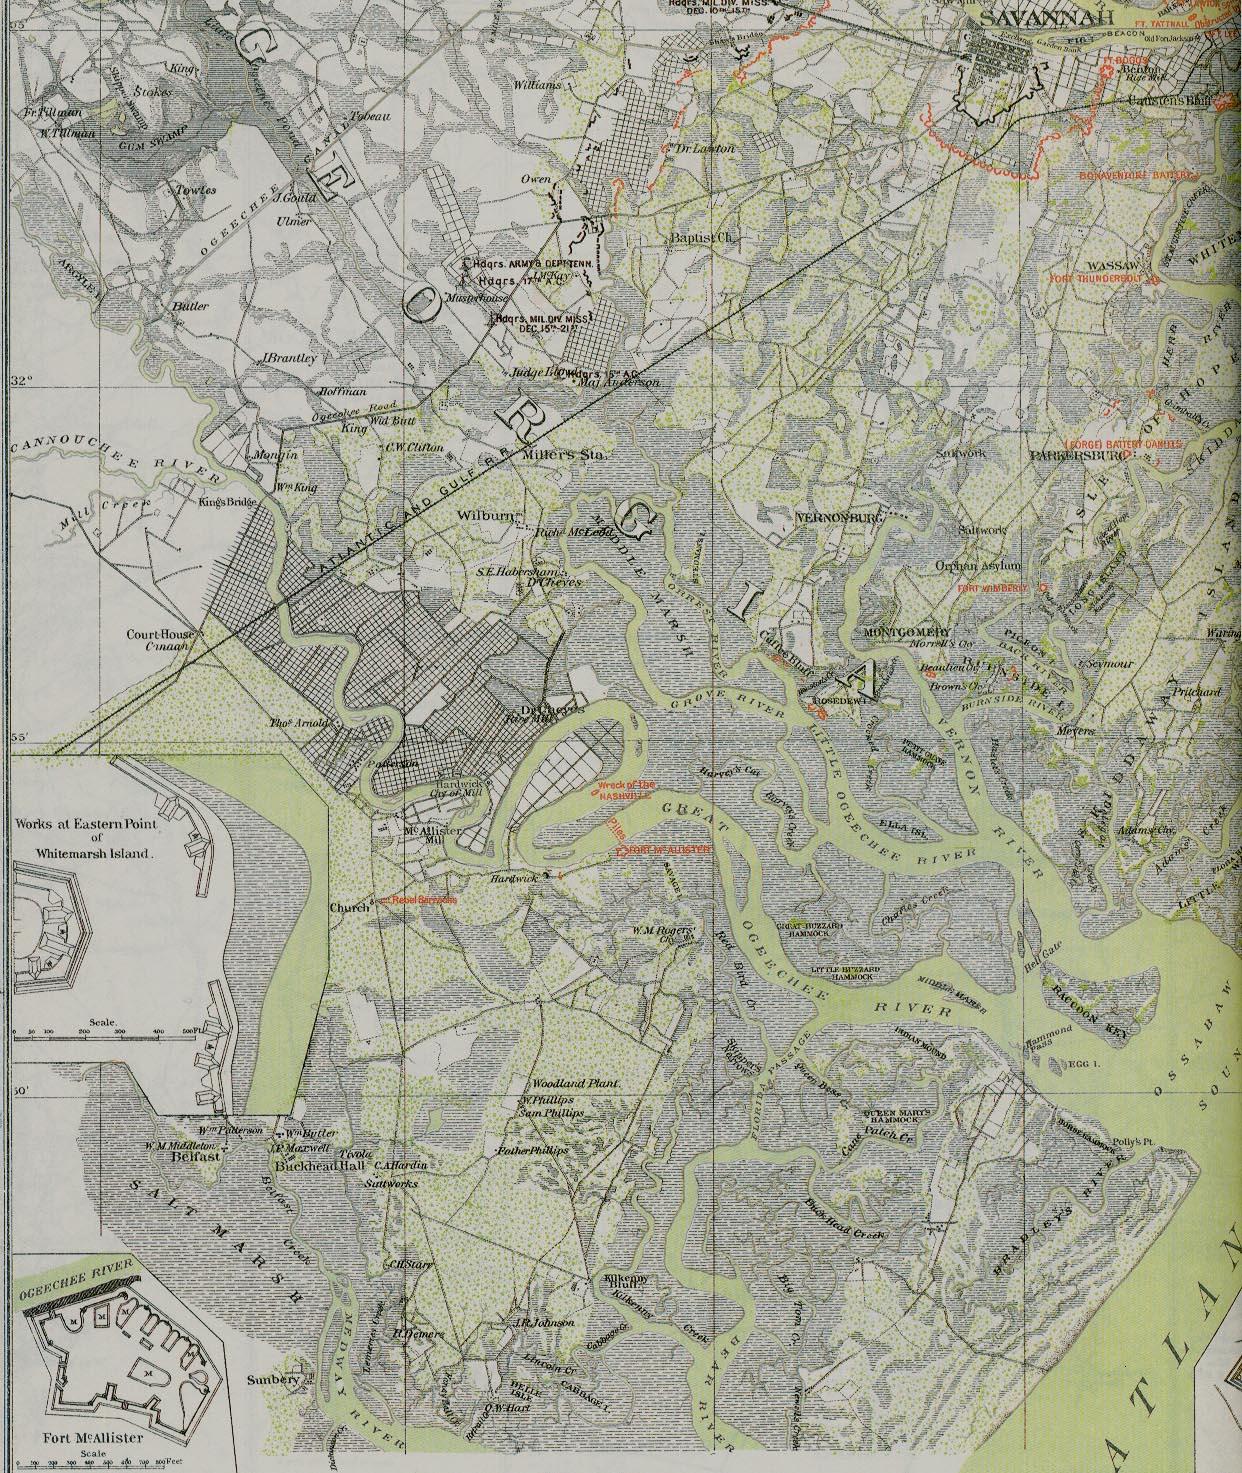 A Brief History of Capt. N.B. Clinch's Artillery Company; by ... on army forts in georgia, chatham county georgia, chattanooga georgia, skidaway island georgia, bryan county georgia, savannah georgia, georgetown georgia, civil war forts in georgia, shiloh georgia, bonaventure cemetery georgia, oxford georgia, thunderbolt georgia, garden city georgia, resaca georgia, bloomingdale georgia, wilmington island georgia, whitemarsh island georgia, woodville georgia, richmond hill georgia, chickamauga georgia,